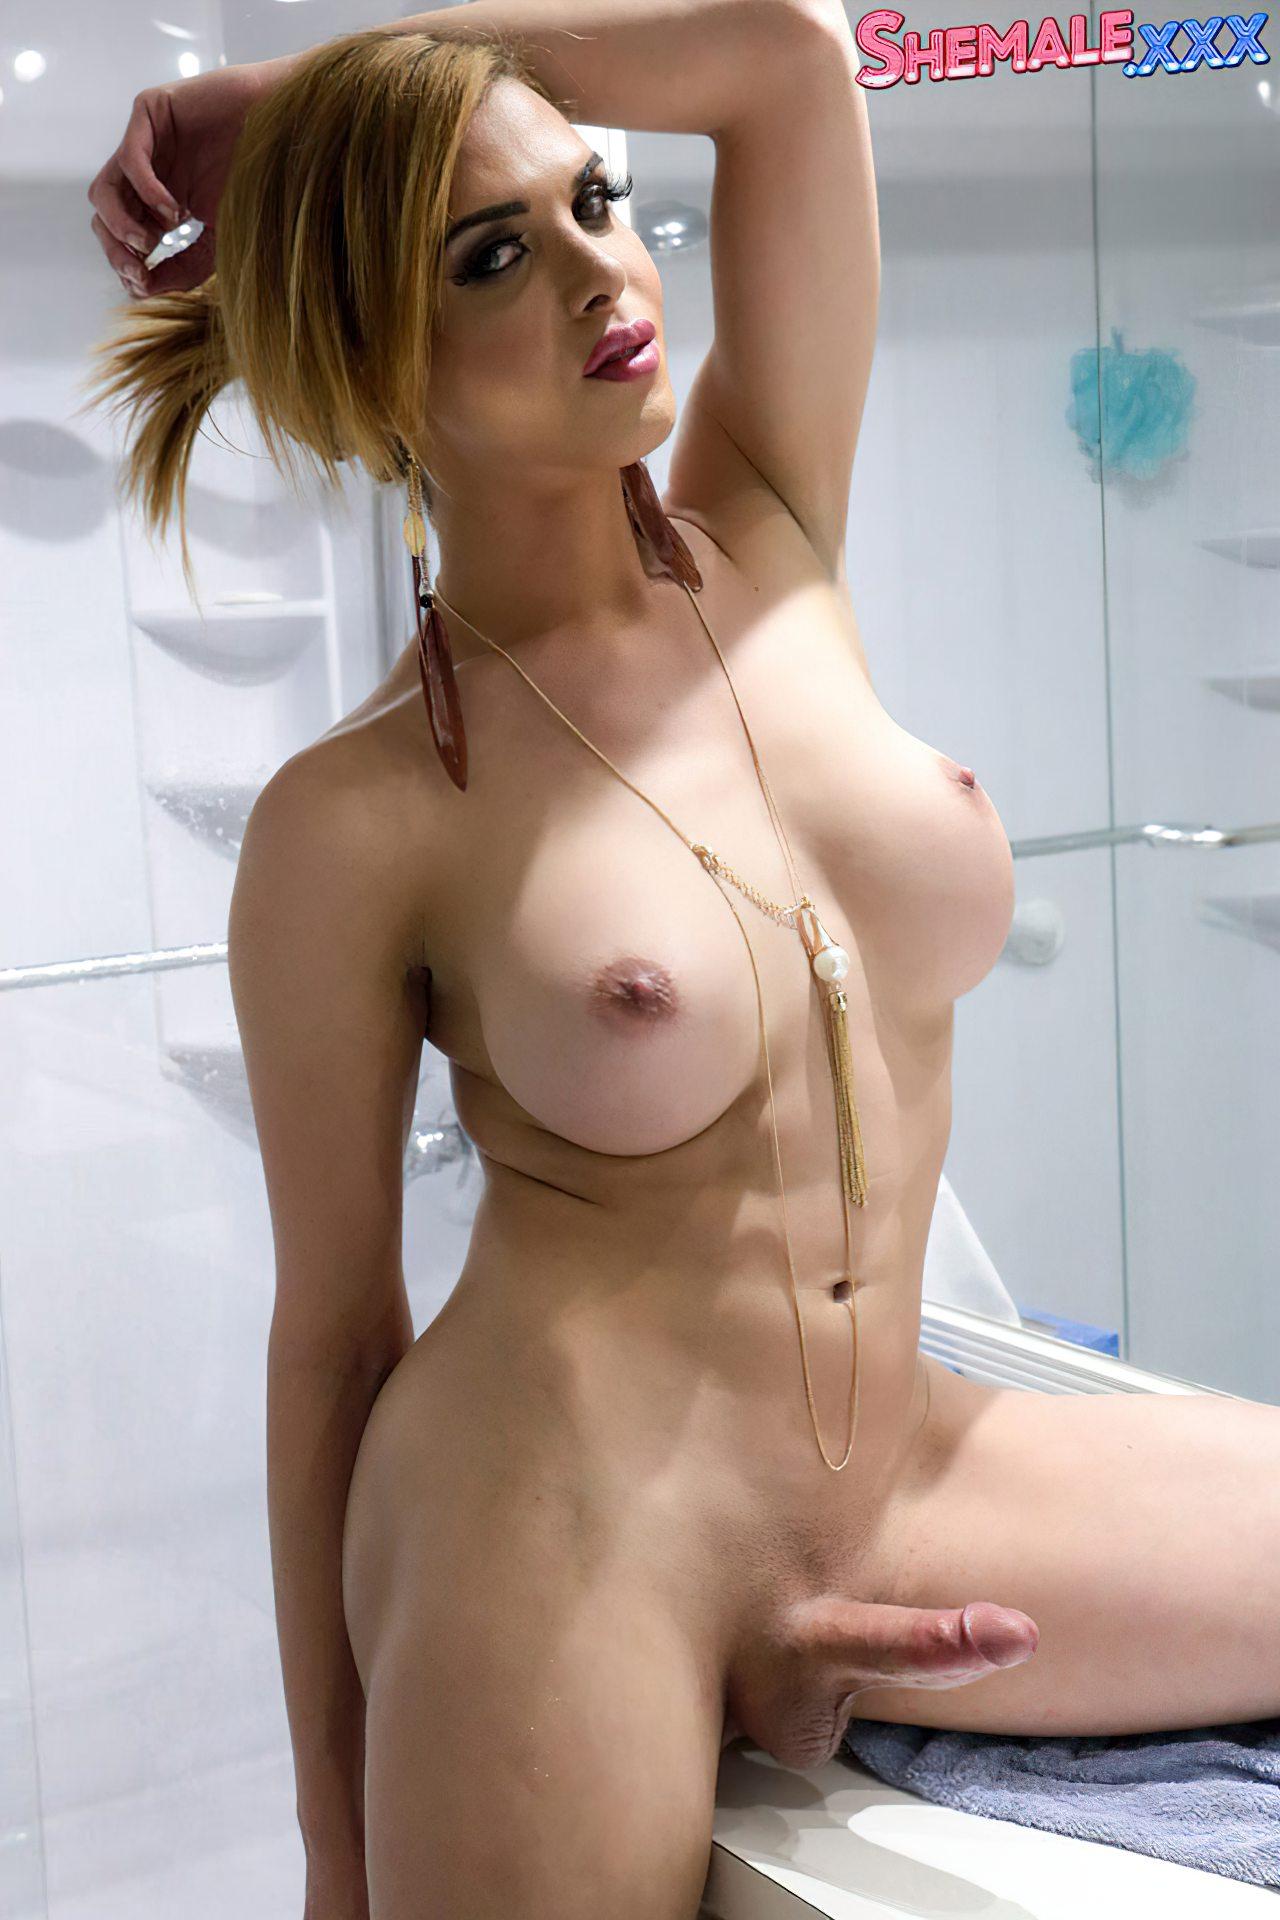 Travestis Pictures (18)